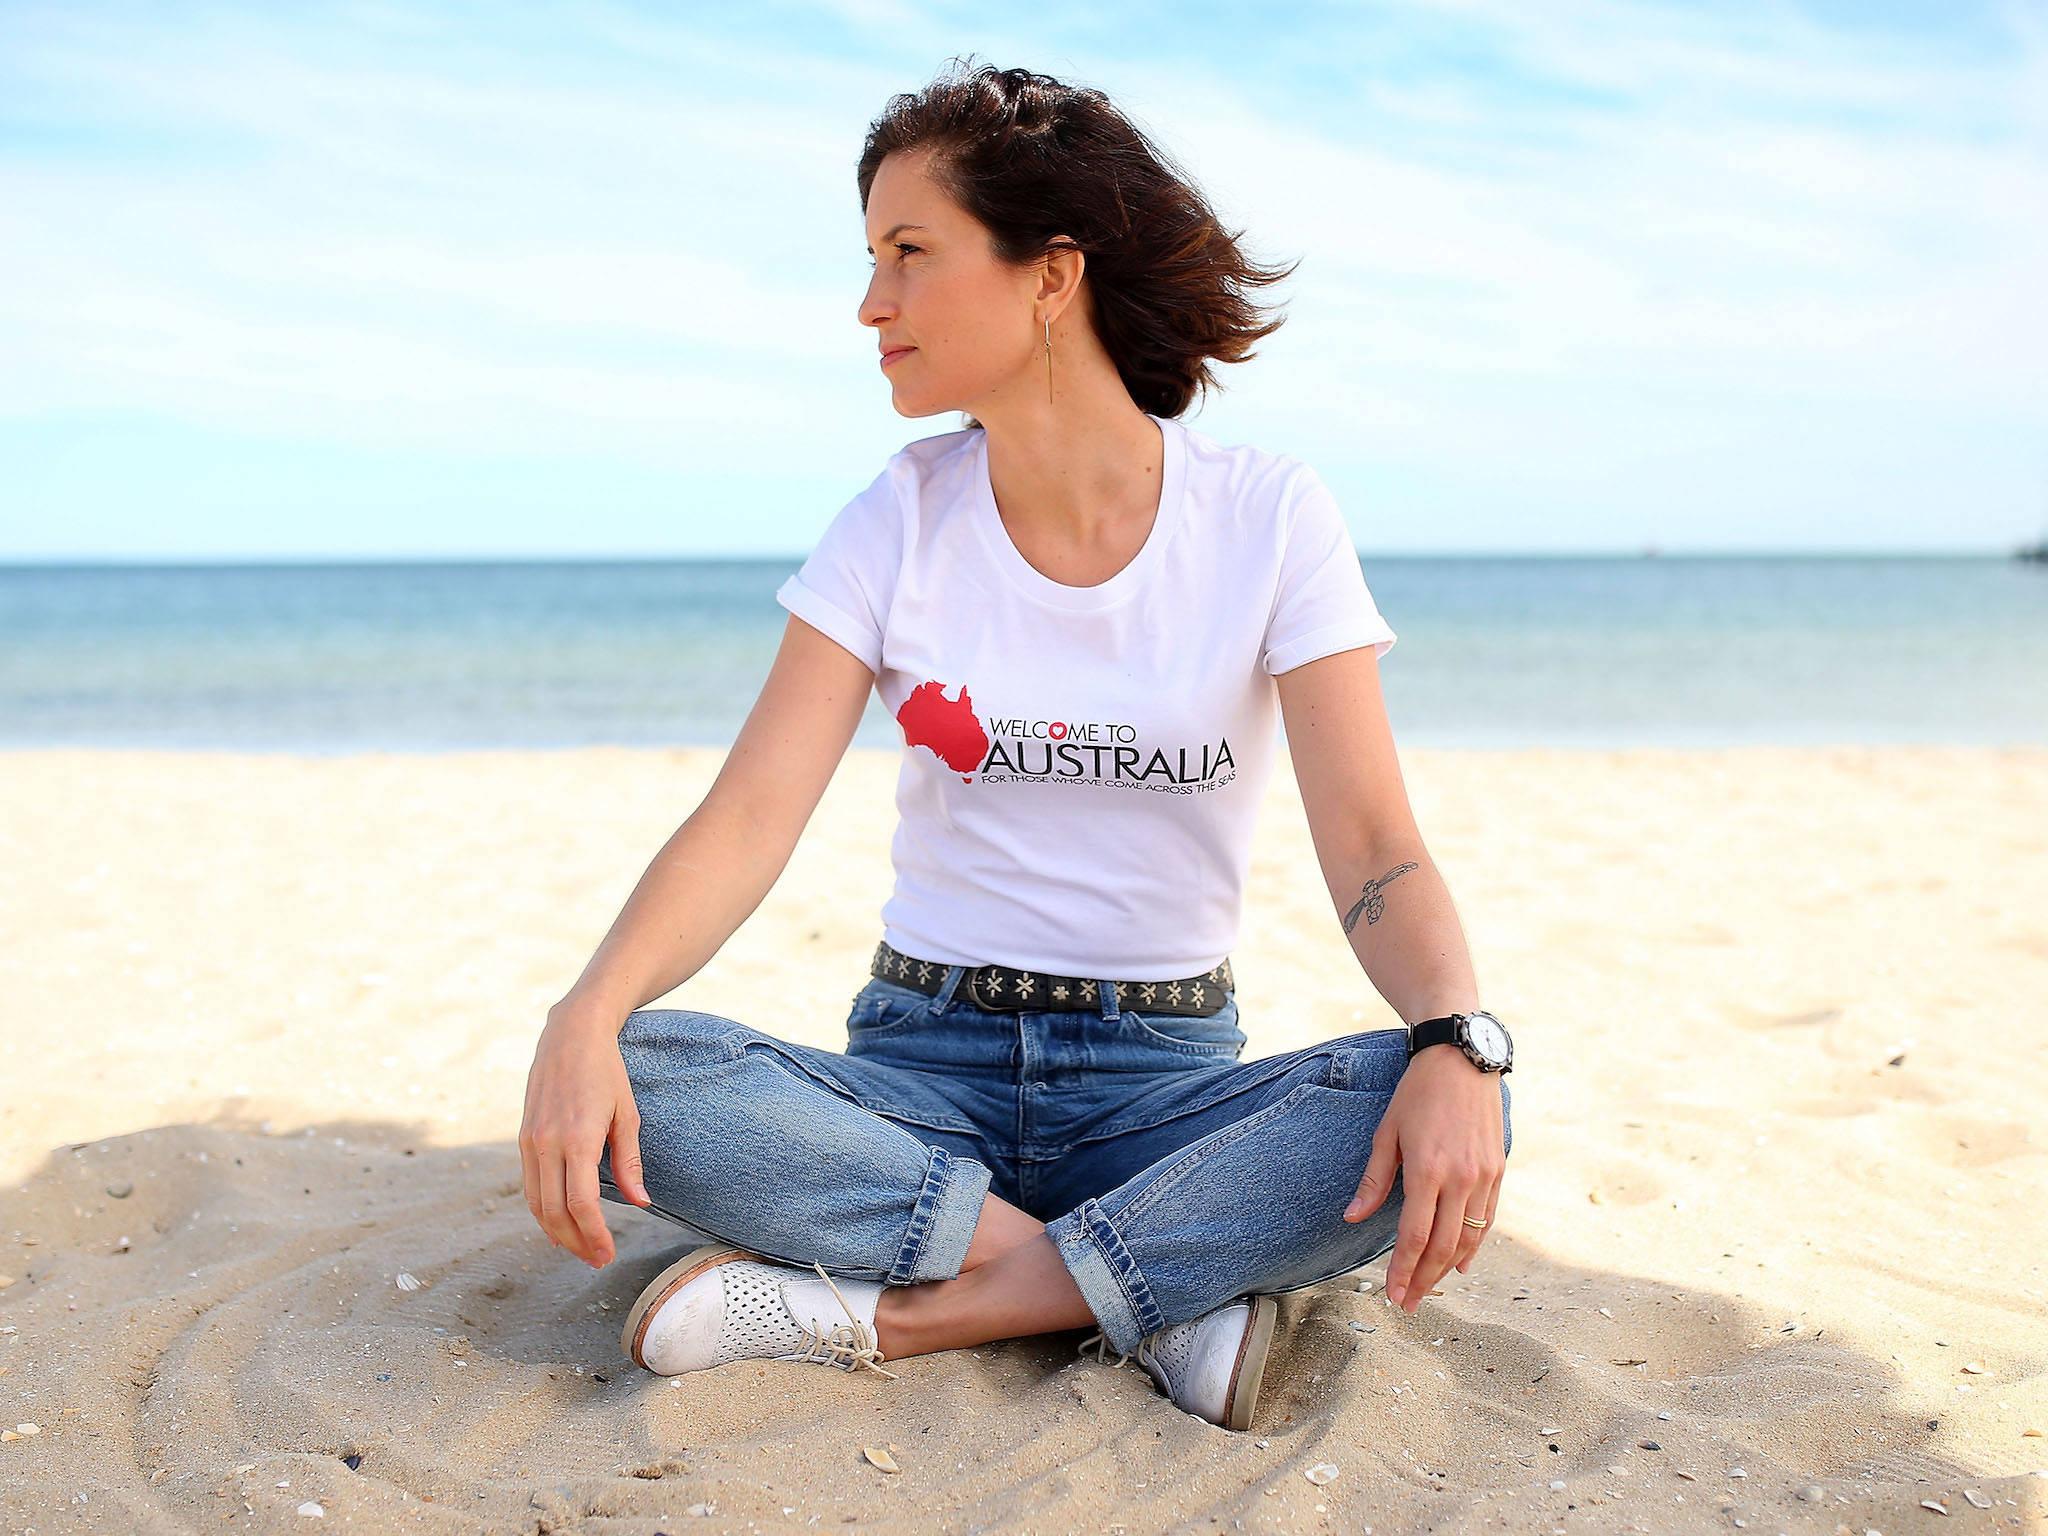 Missy Higgins sitting cross-legged on the beach